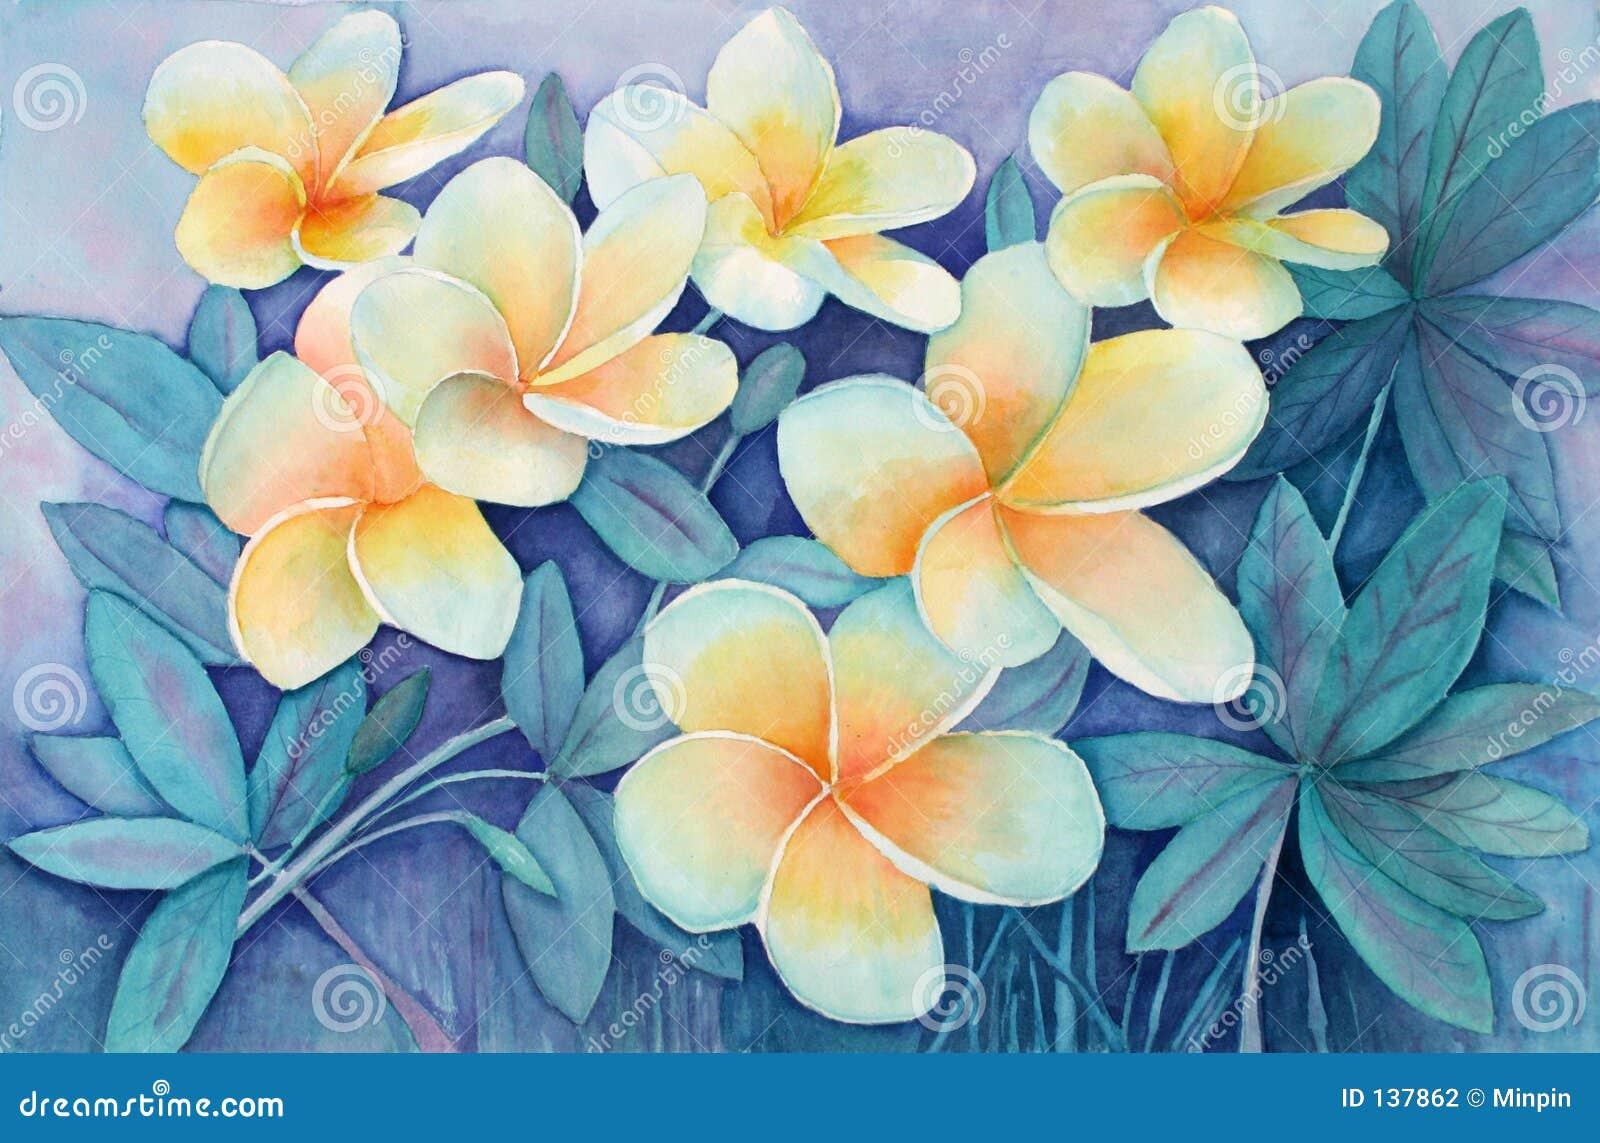 Aquarelle initiale - fleurs